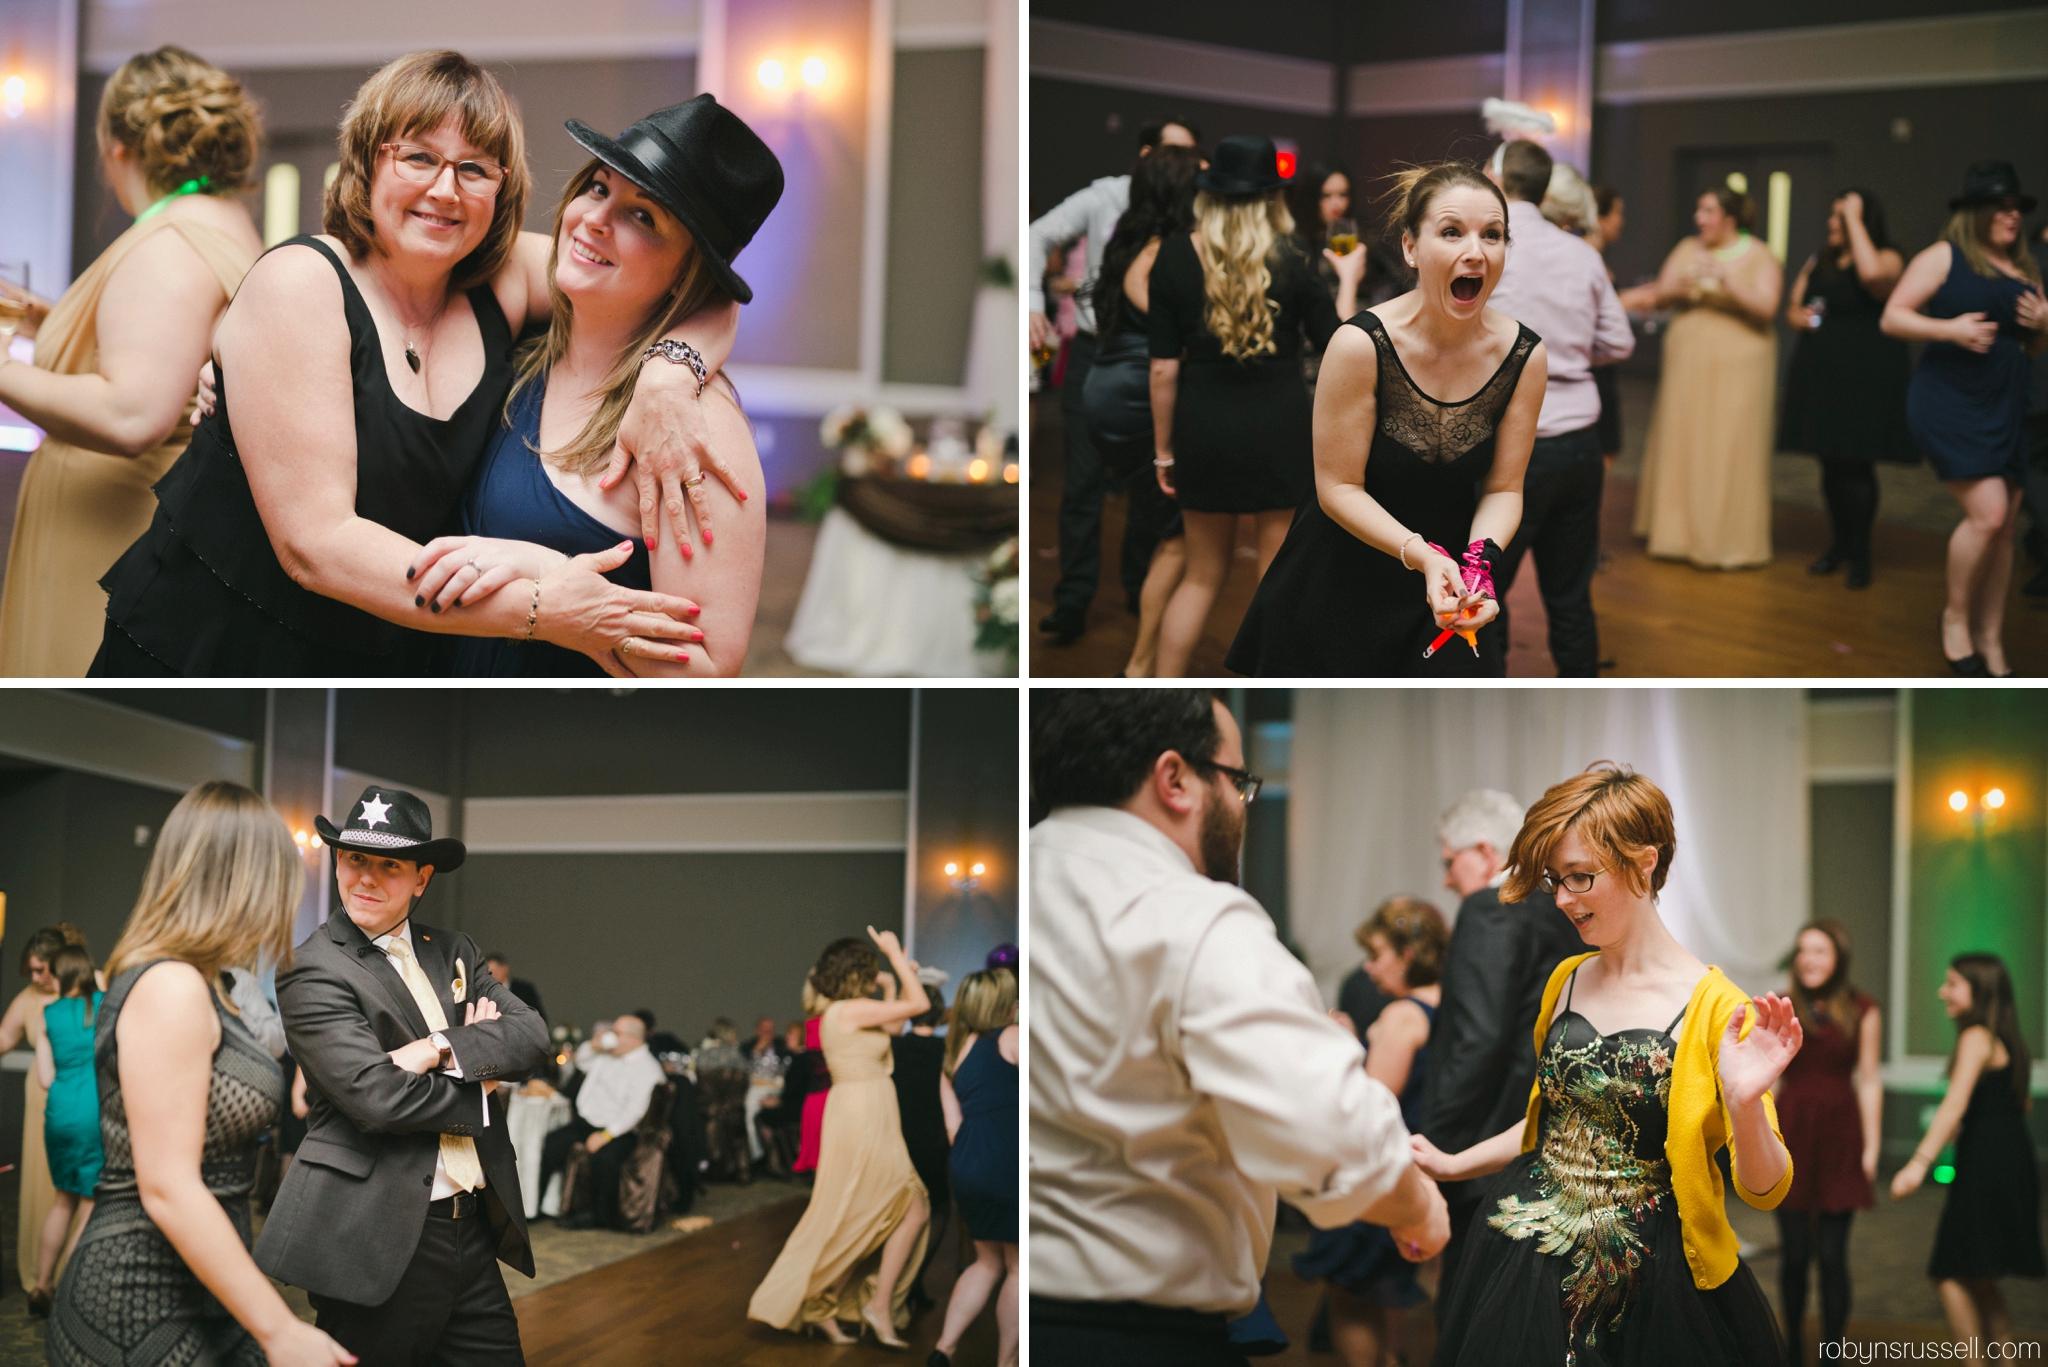 72-guests-having-fun-on-dancefloor.jpg